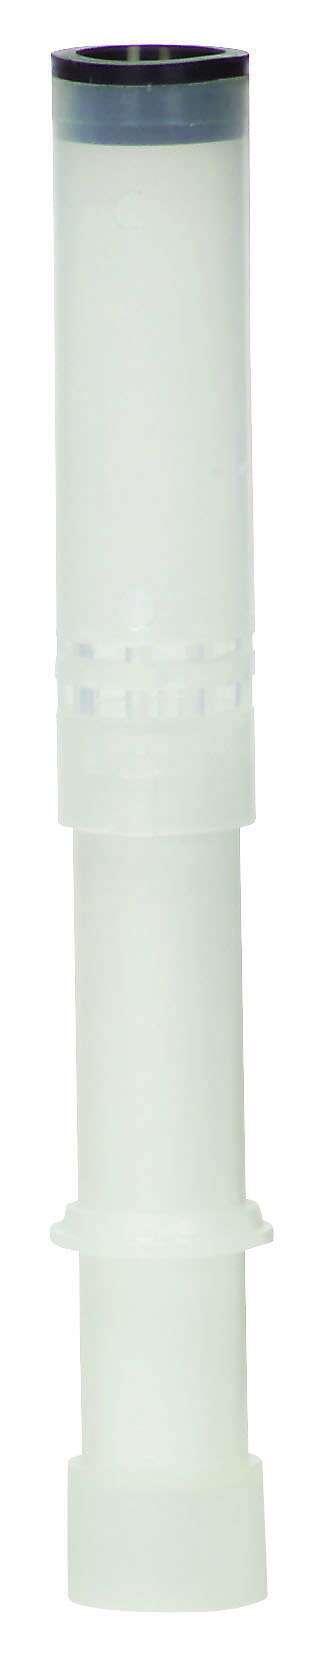 "Everpure EV979902 ScaleStick with HydroBlend"" compound"